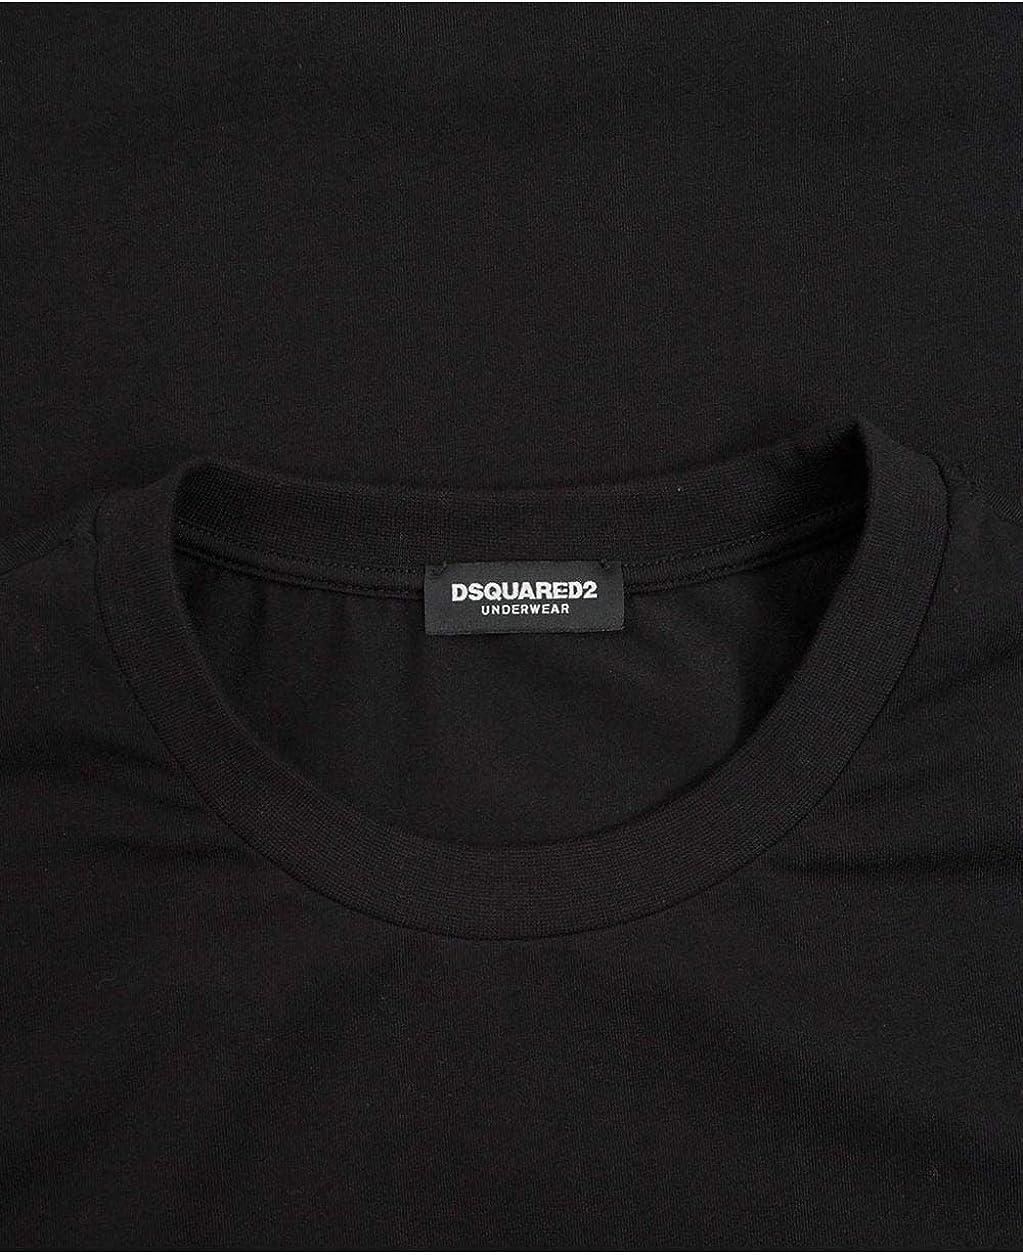 Dsquared2 Loungewear Cuff Taped Logo T-Shirt XL Black